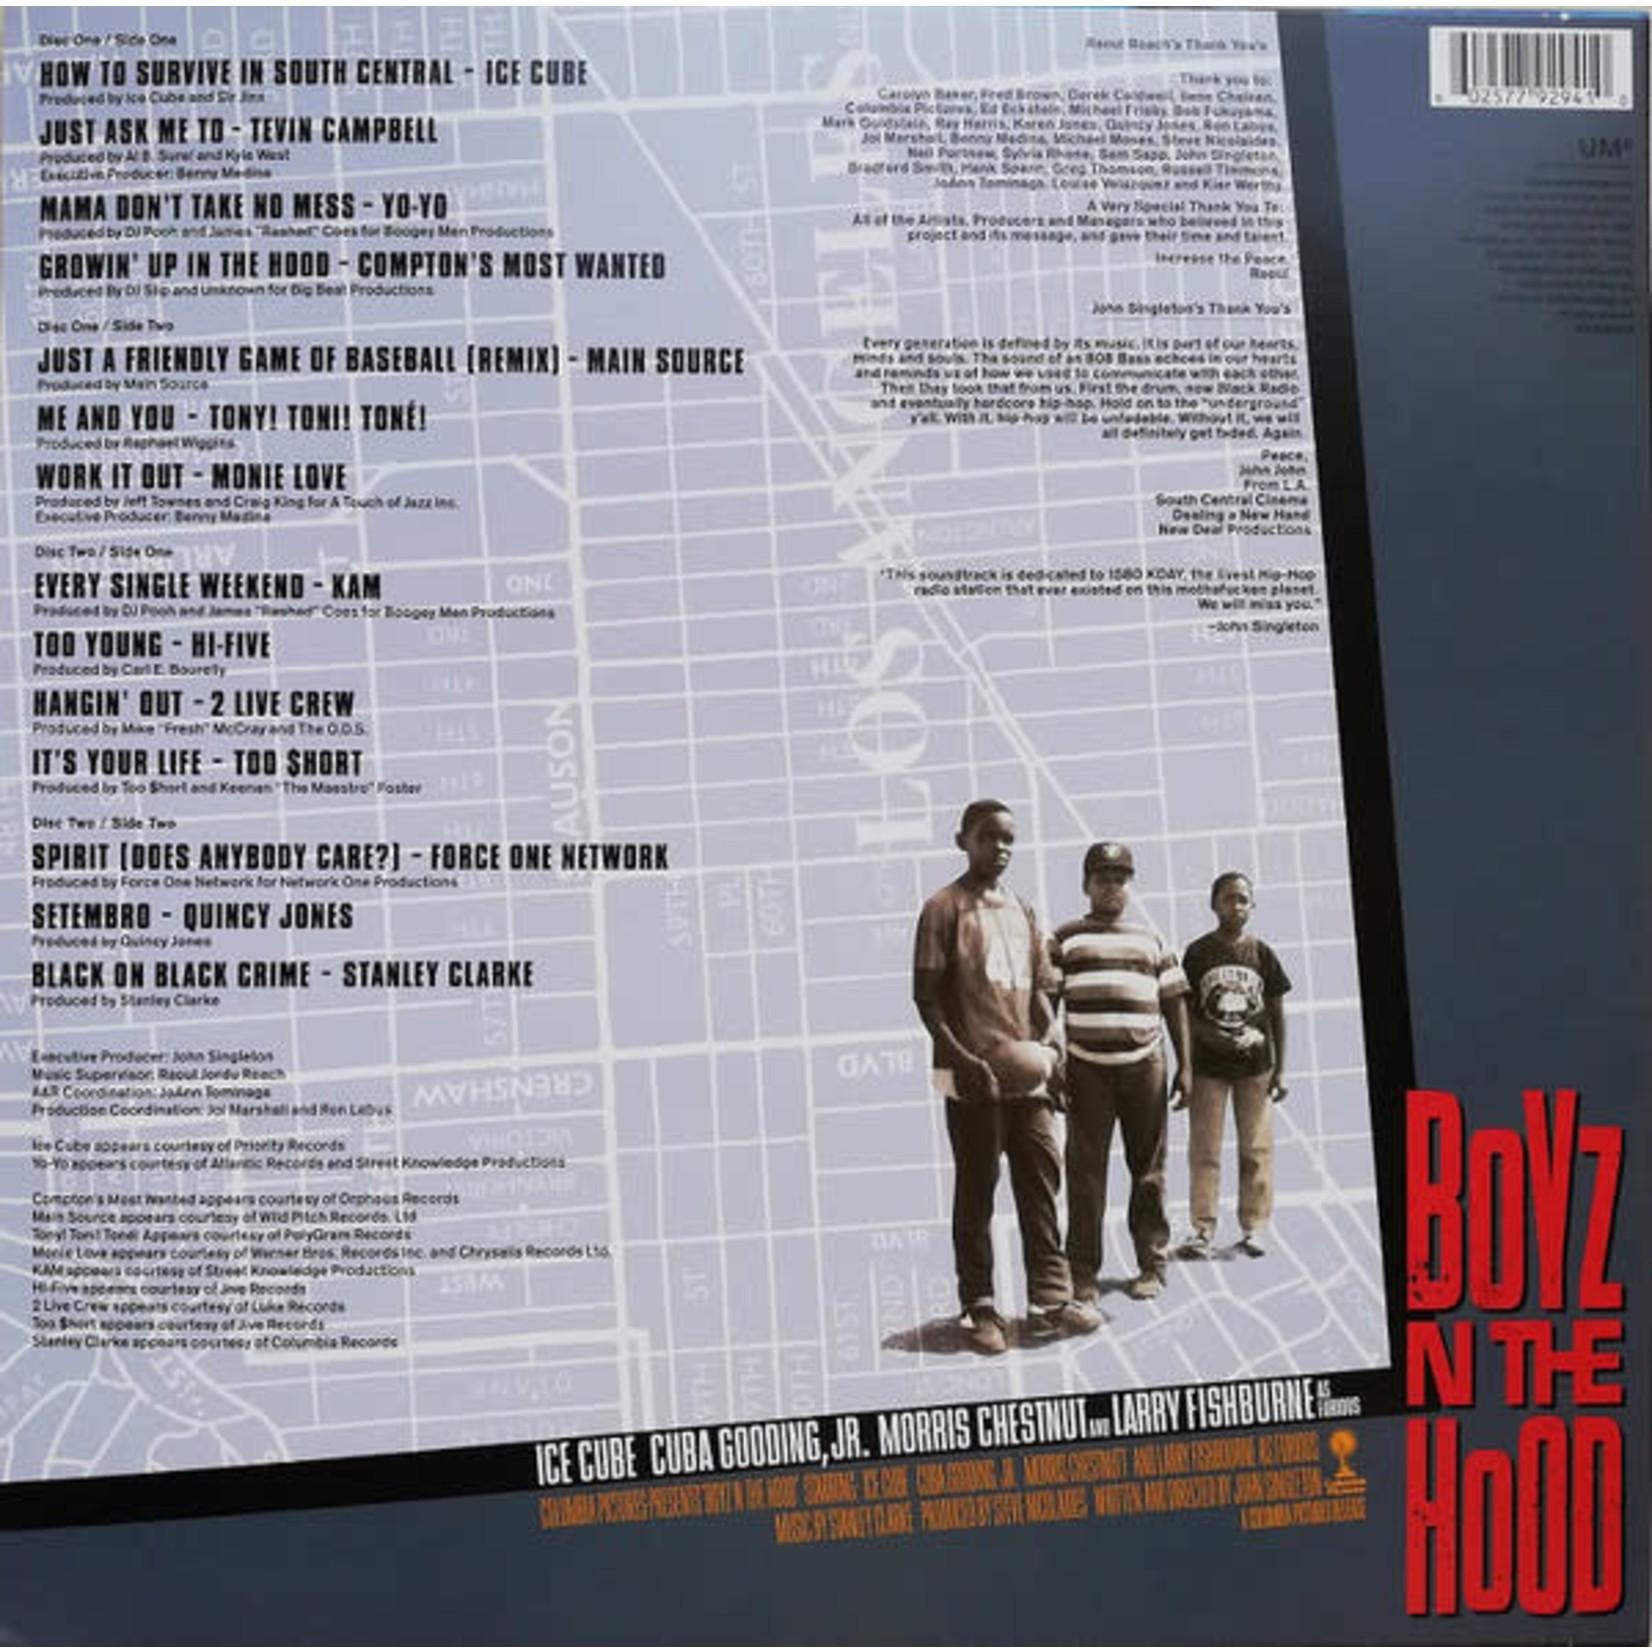 VARIOUS ARTISTS BOYZ N THE HOOD OST (2LP)